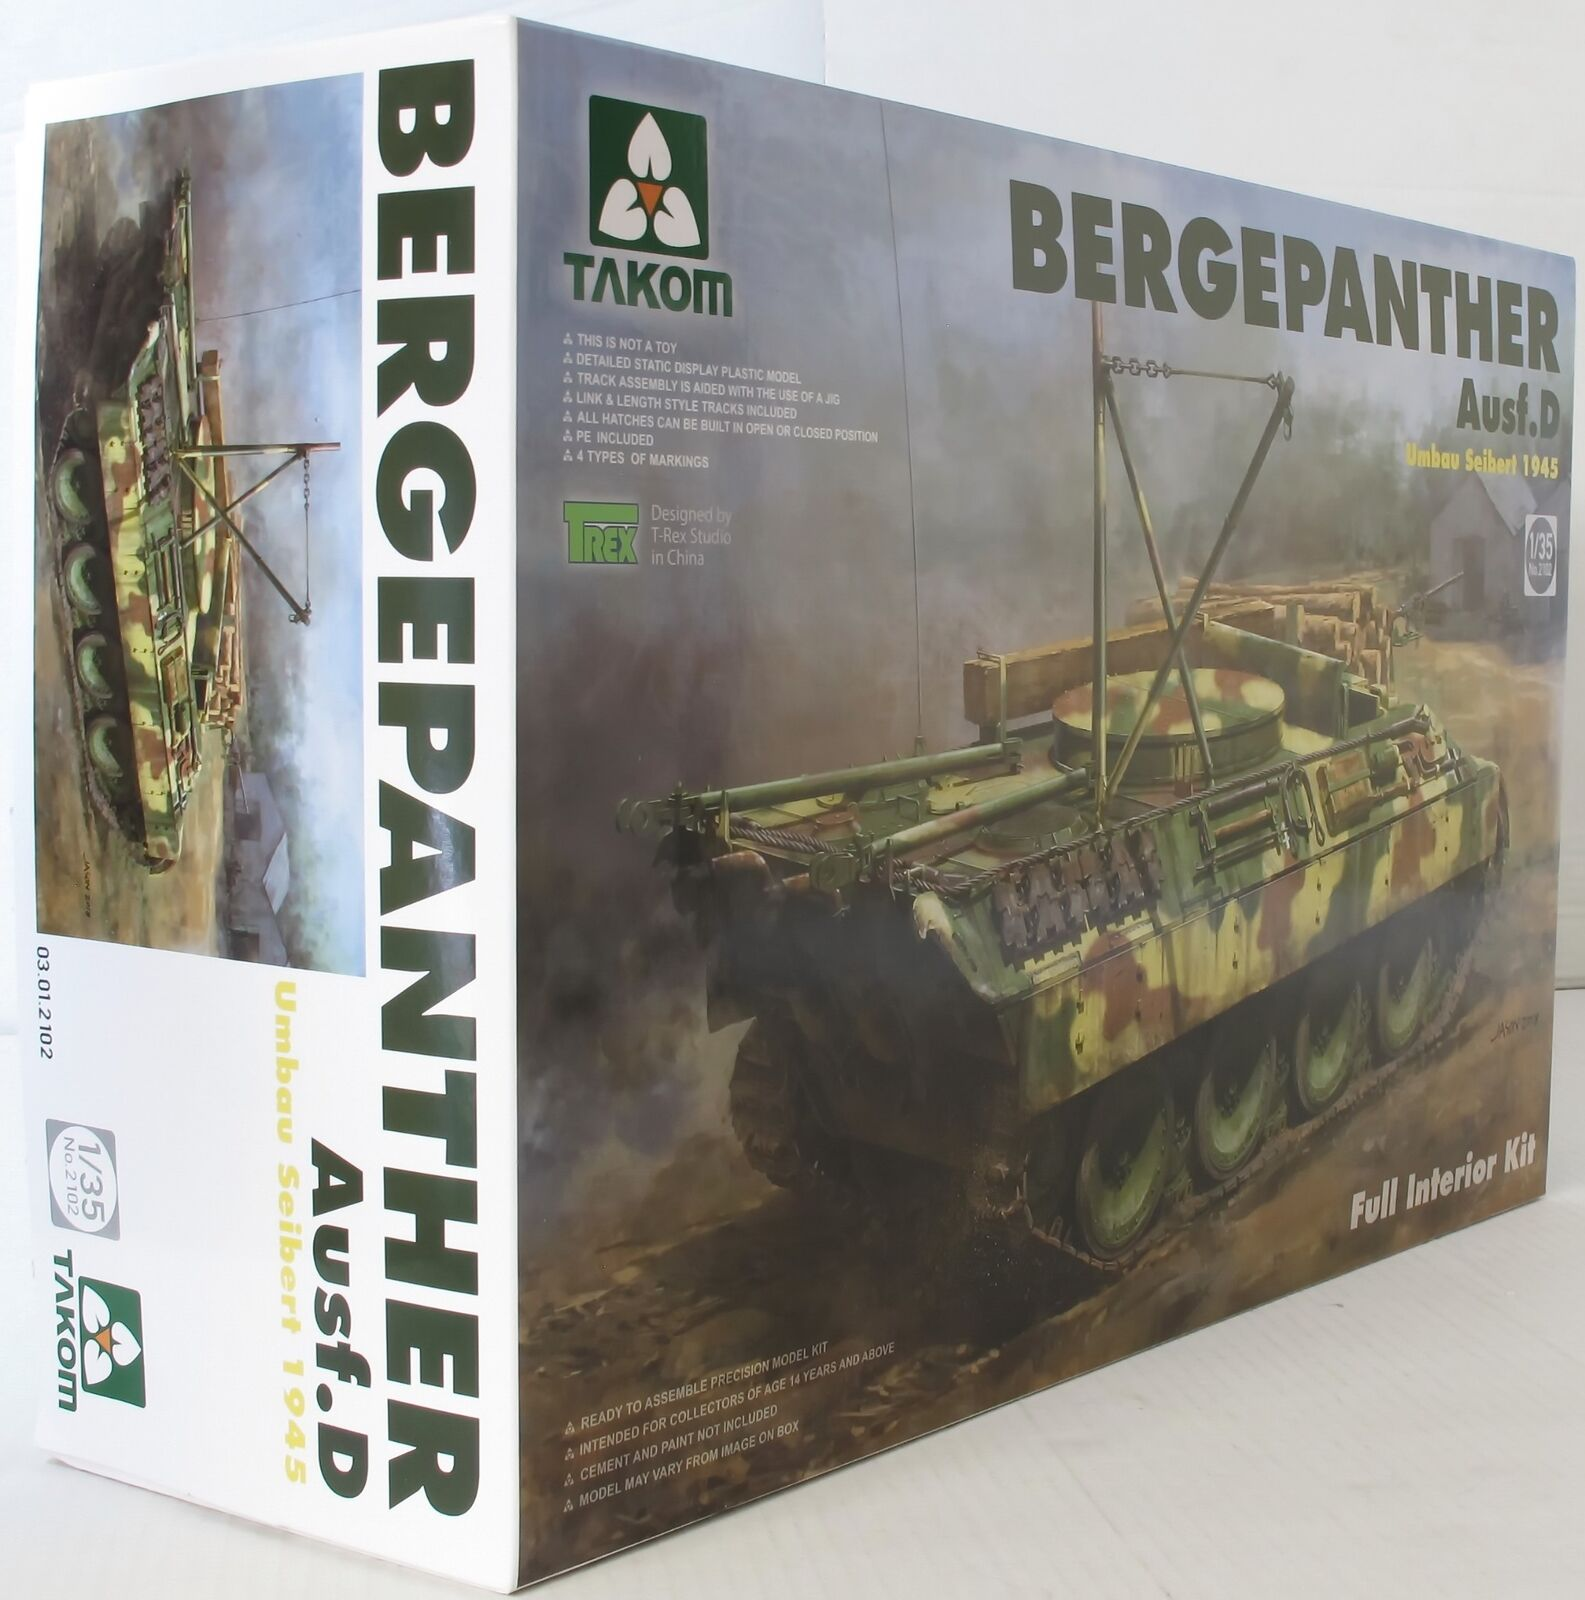 Takom 1 35 02102 Bergepanther Ausf D Umbau Seibert 1945  Model Military Kit